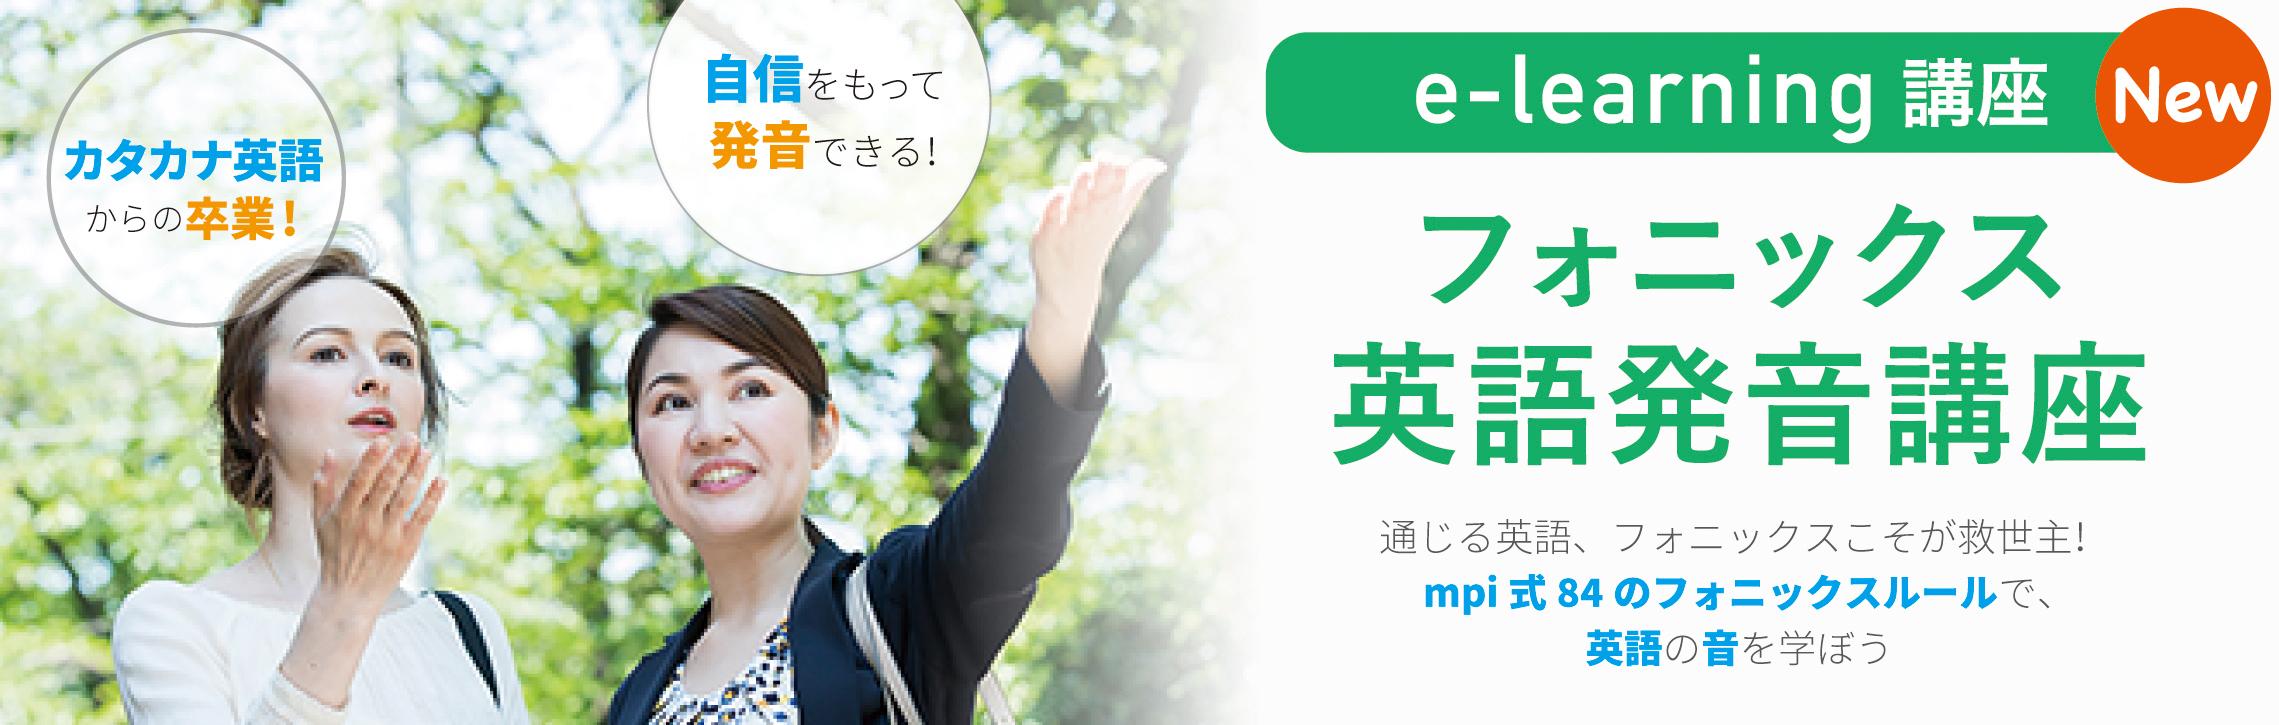 e-learning講座 フォニックス英語発音講座